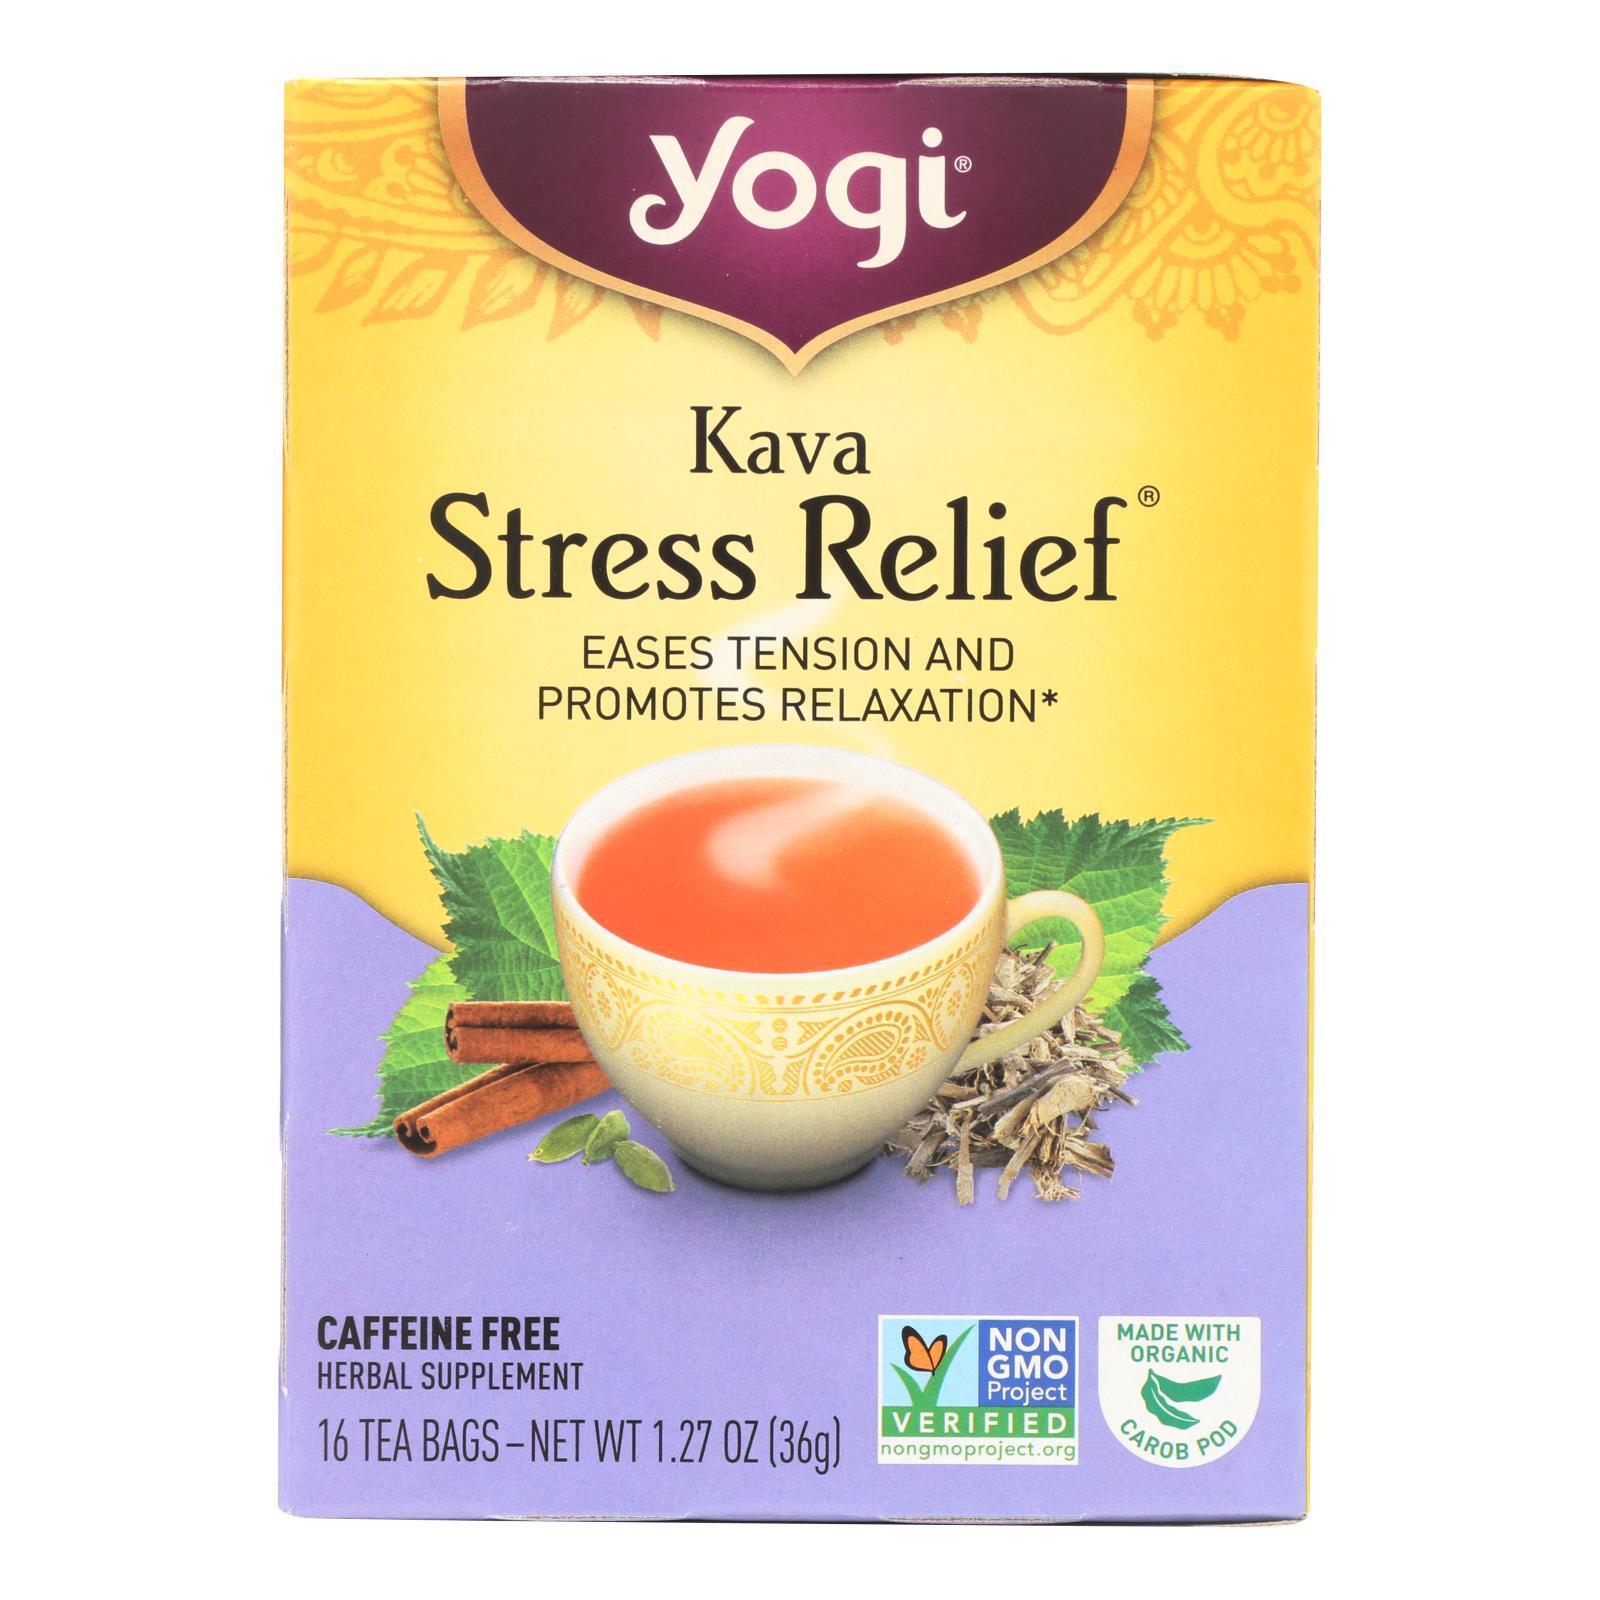 Yogi Tea Kava Stress Relief - Caffeine Free - 16 Tea Bags